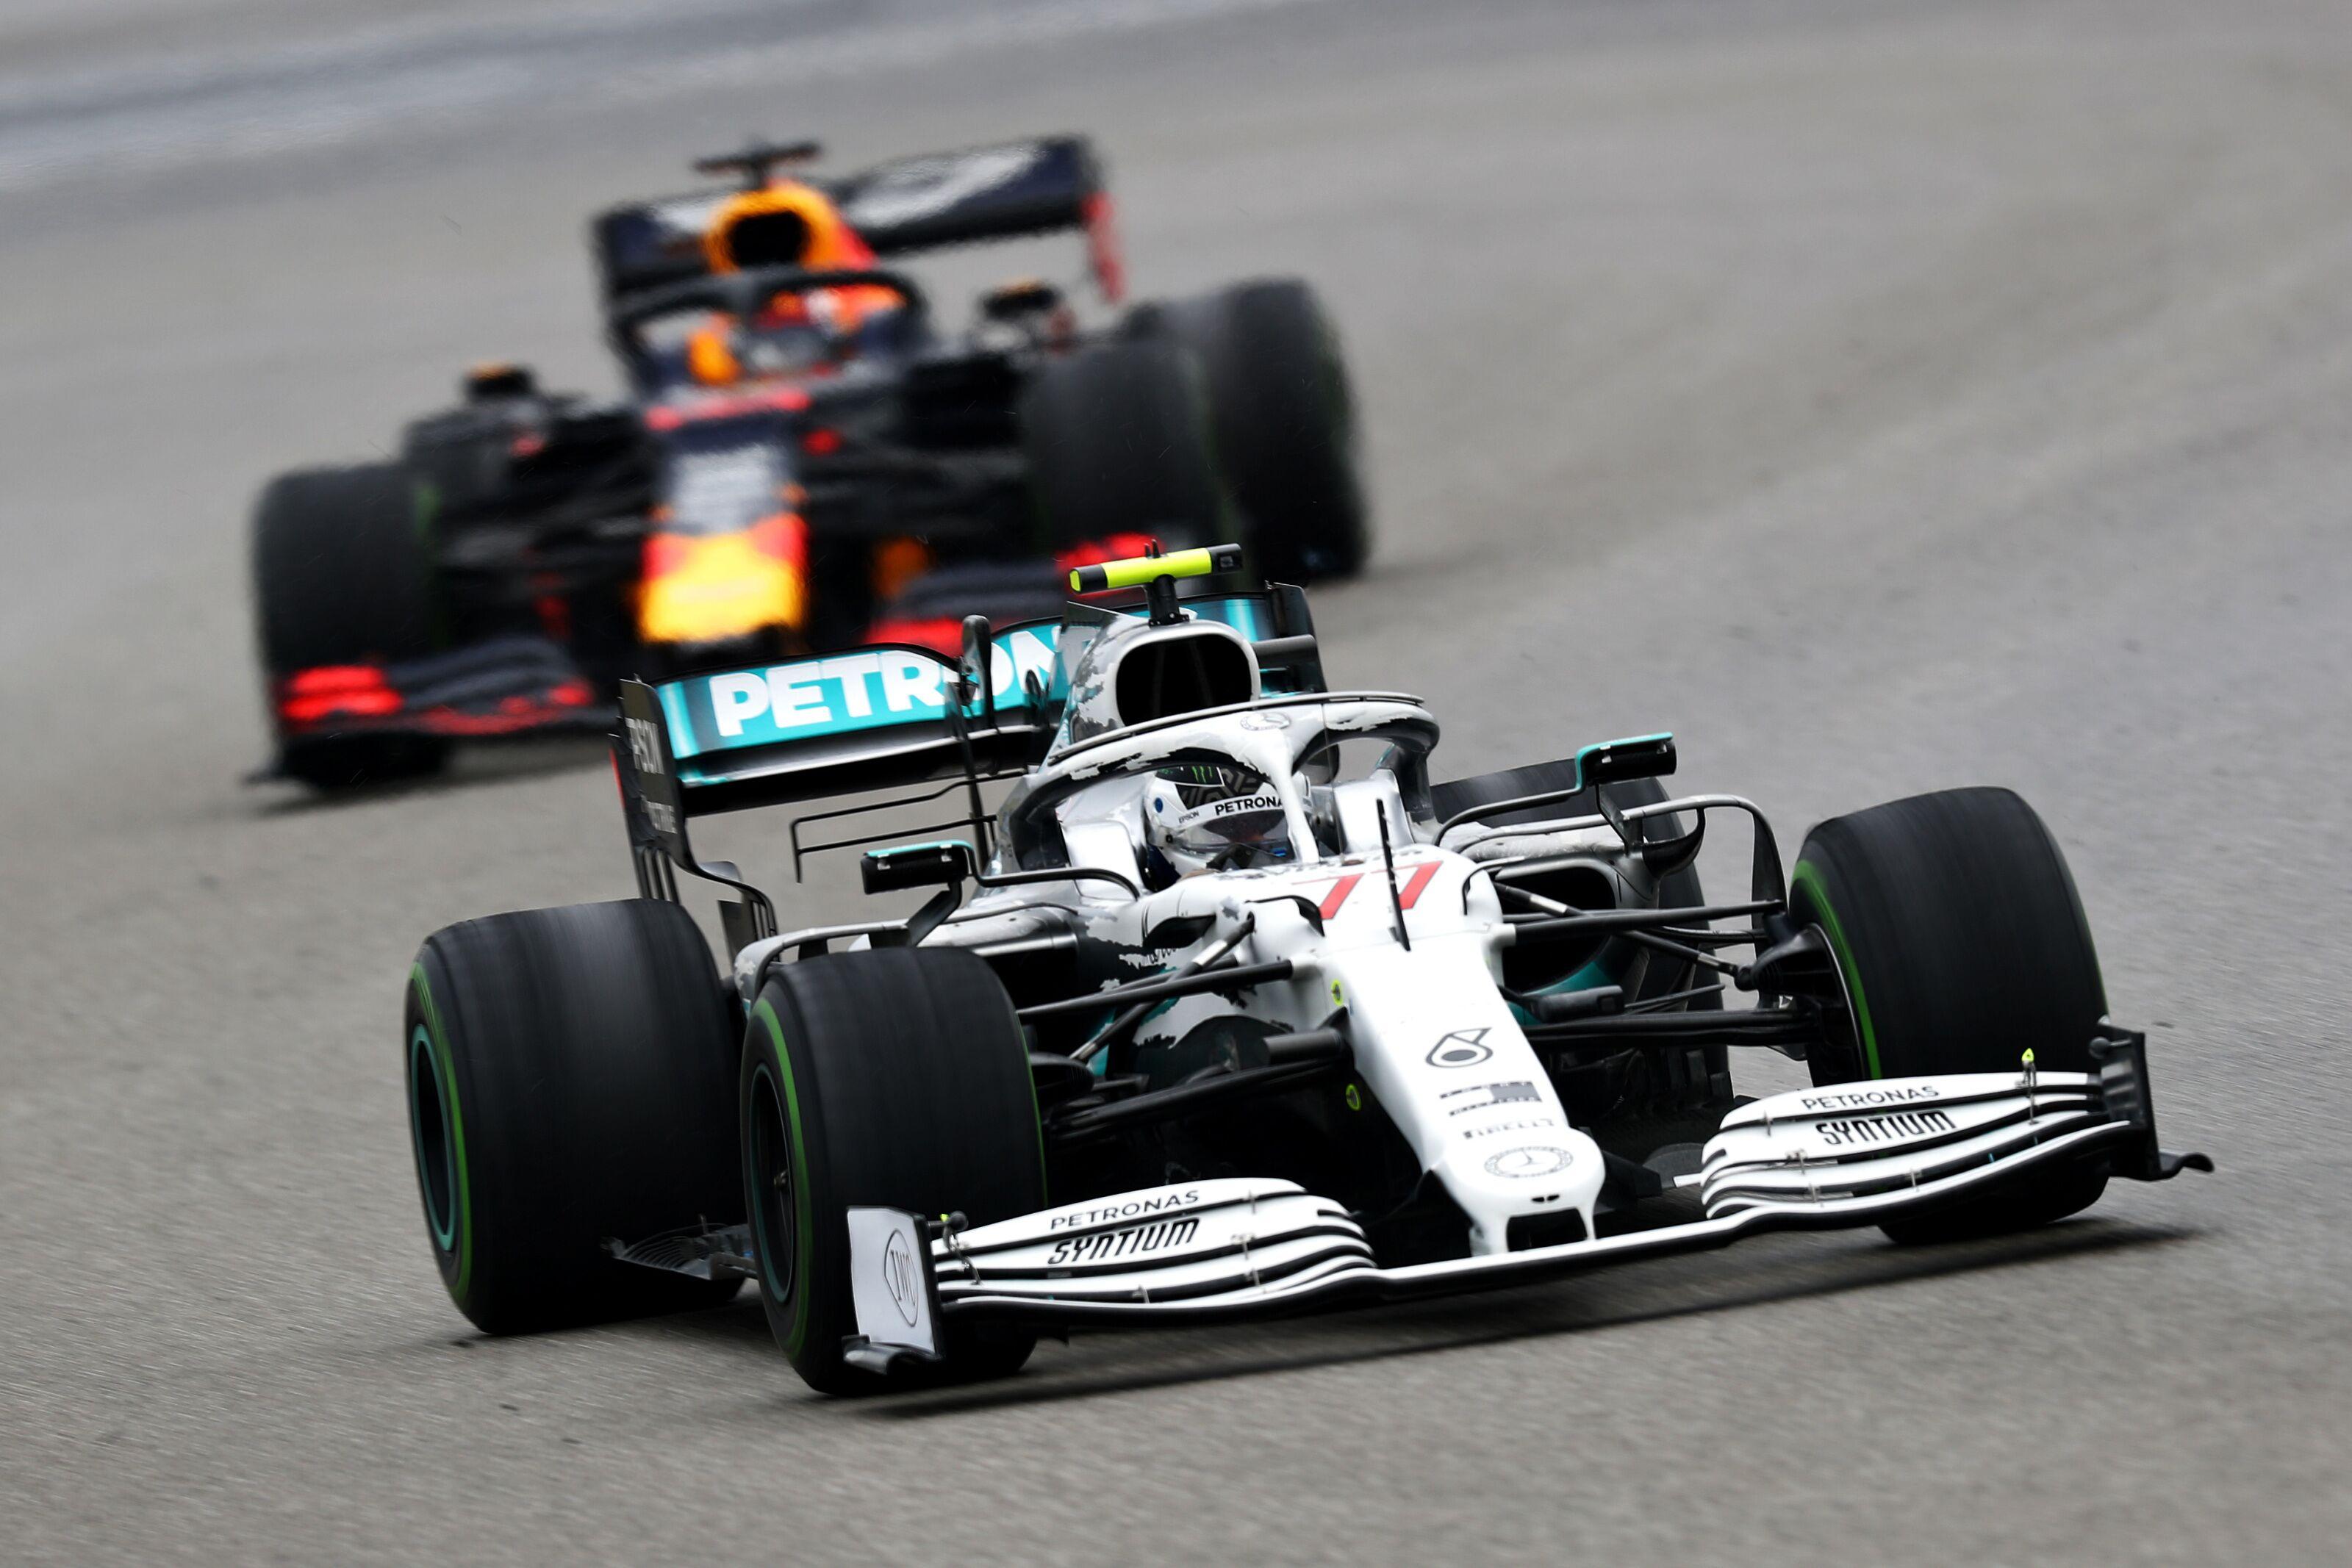 Formula 1: Several open seats headline 2020 Silly Season rumors